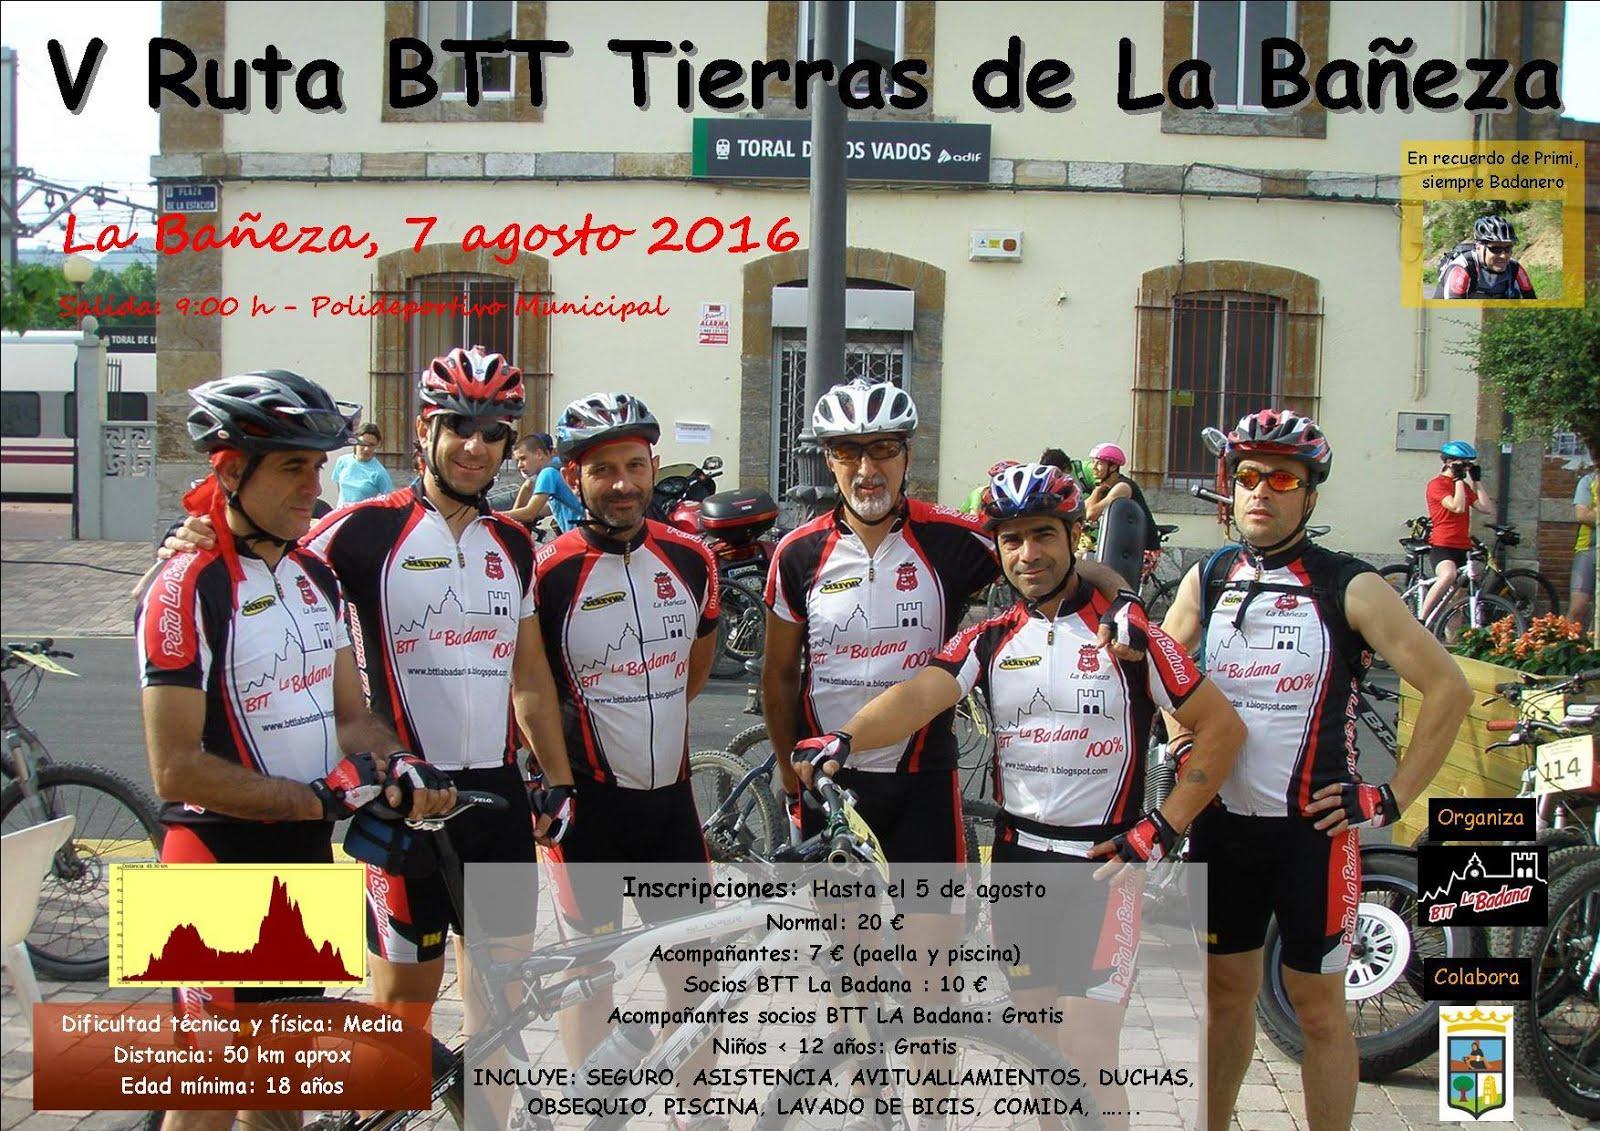 MARCHA BTT TIERRAS DE LA BAÑEZA